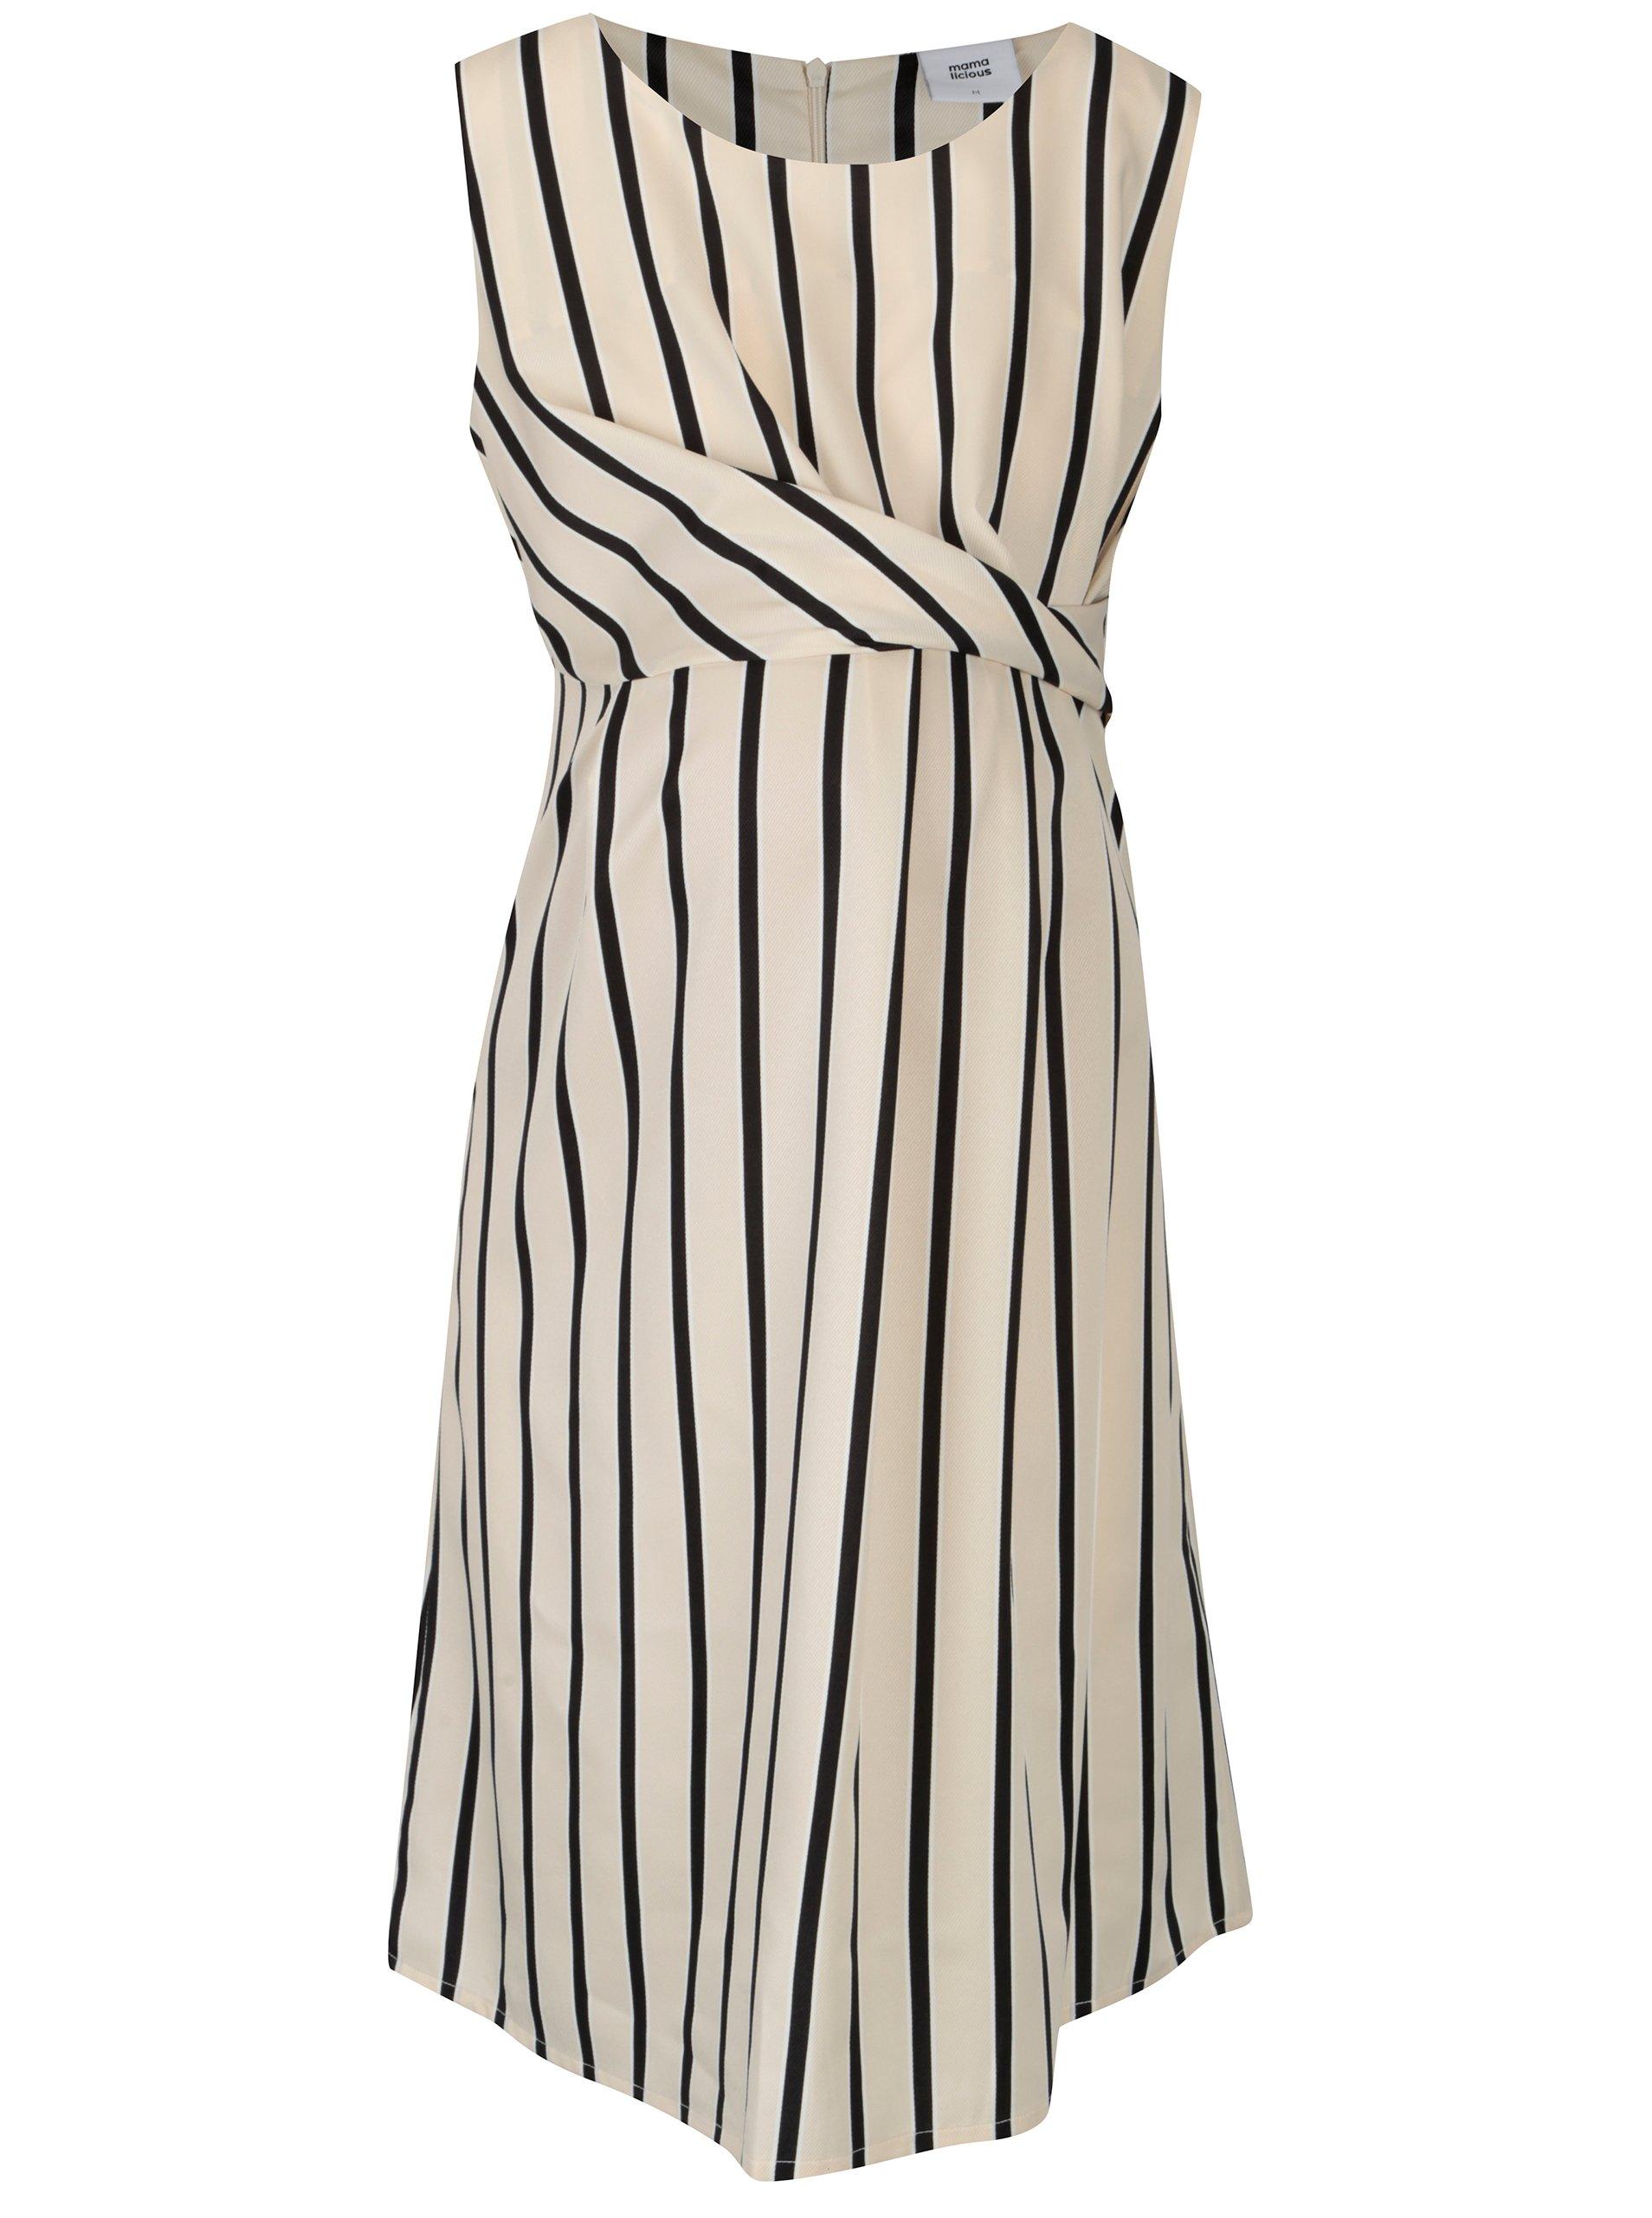 46f5dc05c43f Čierno–béžové pruhované tehotenské šaty Mama.licious Shanne